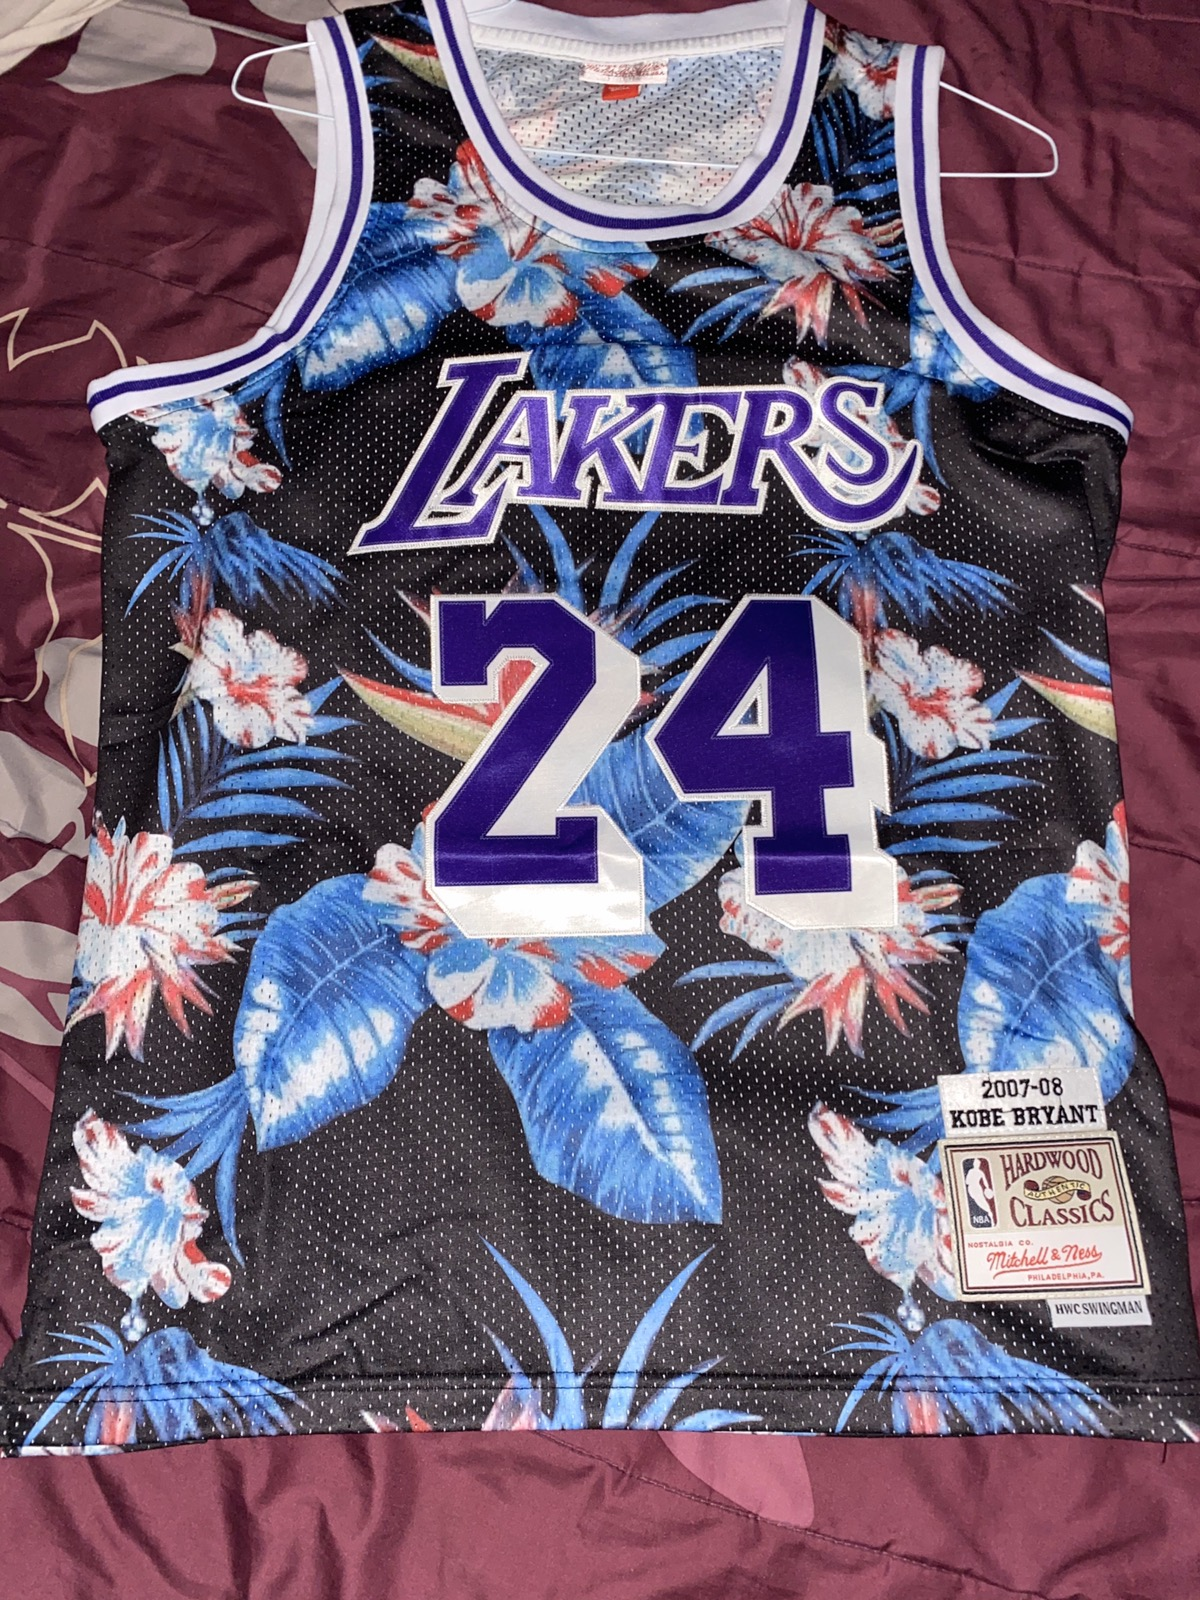 Mitchell & Ness Kobe Bryant Floral Jersey #24